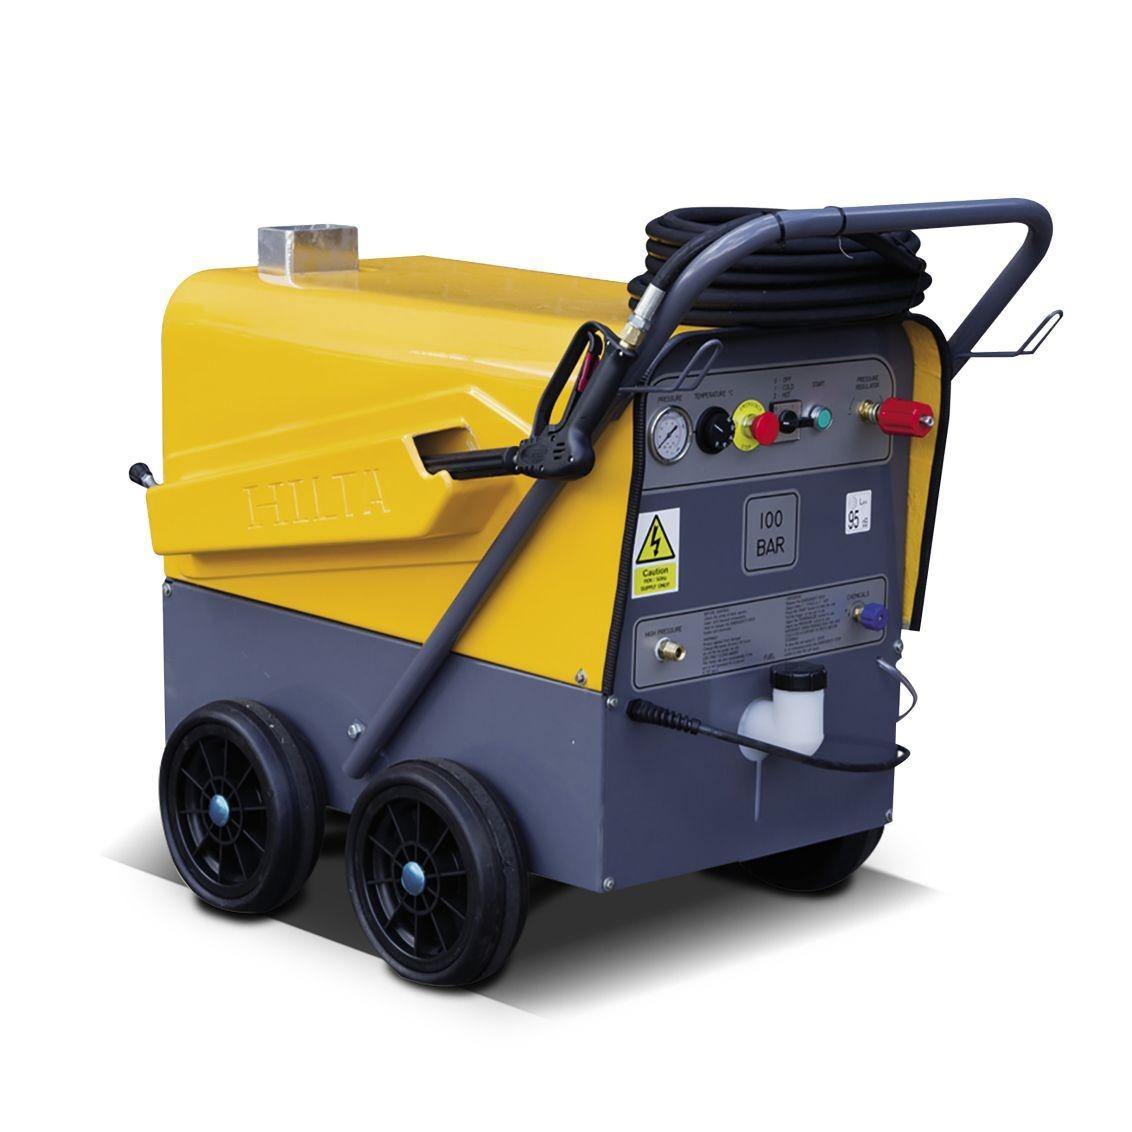 Hilta TW101 Hot Pressure Washer 110v 200Kg